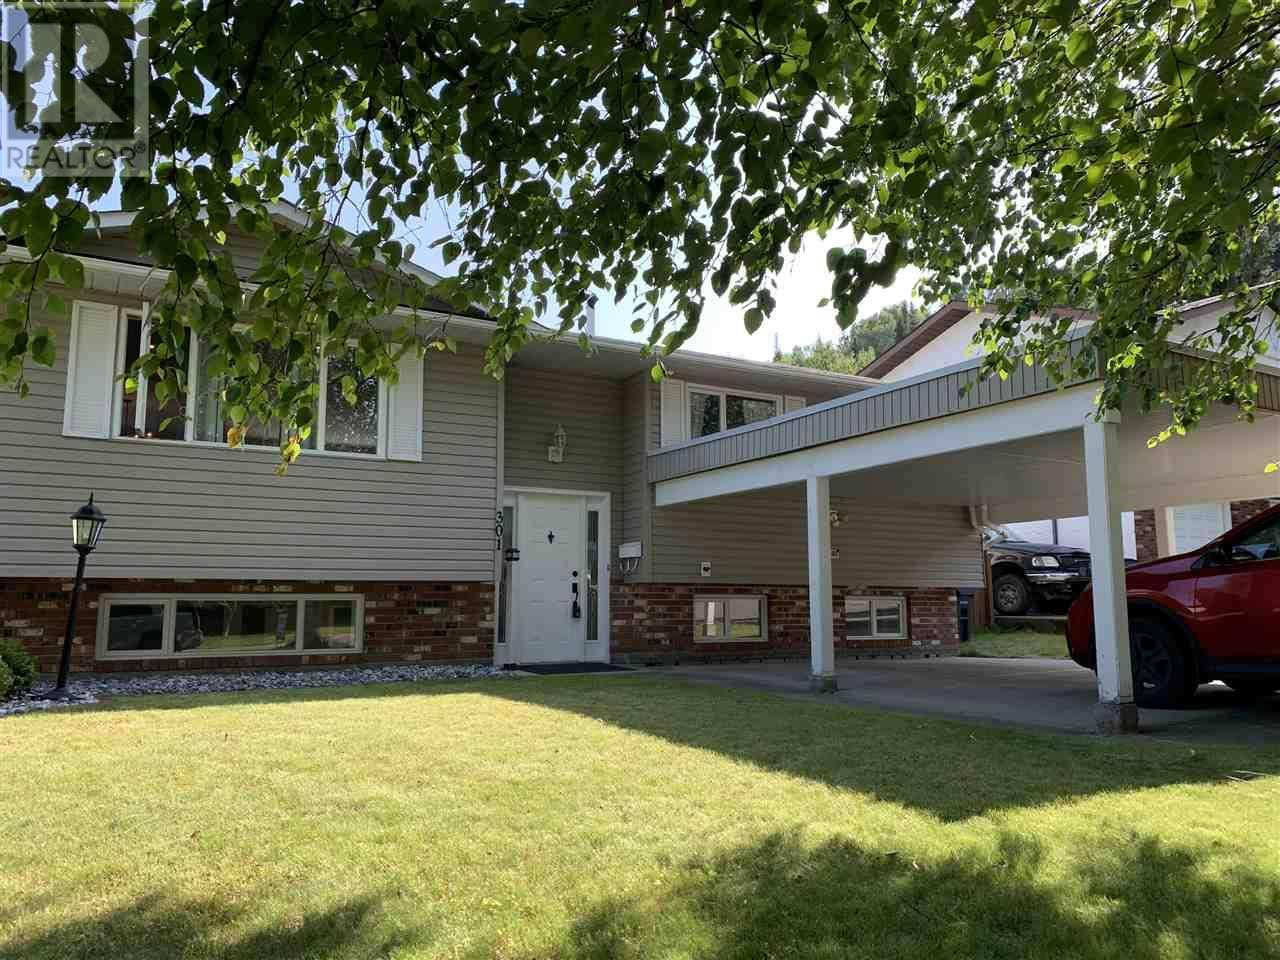 House for sale at 301 Moran Cres Prince George British Columbia - MLS: R2398026